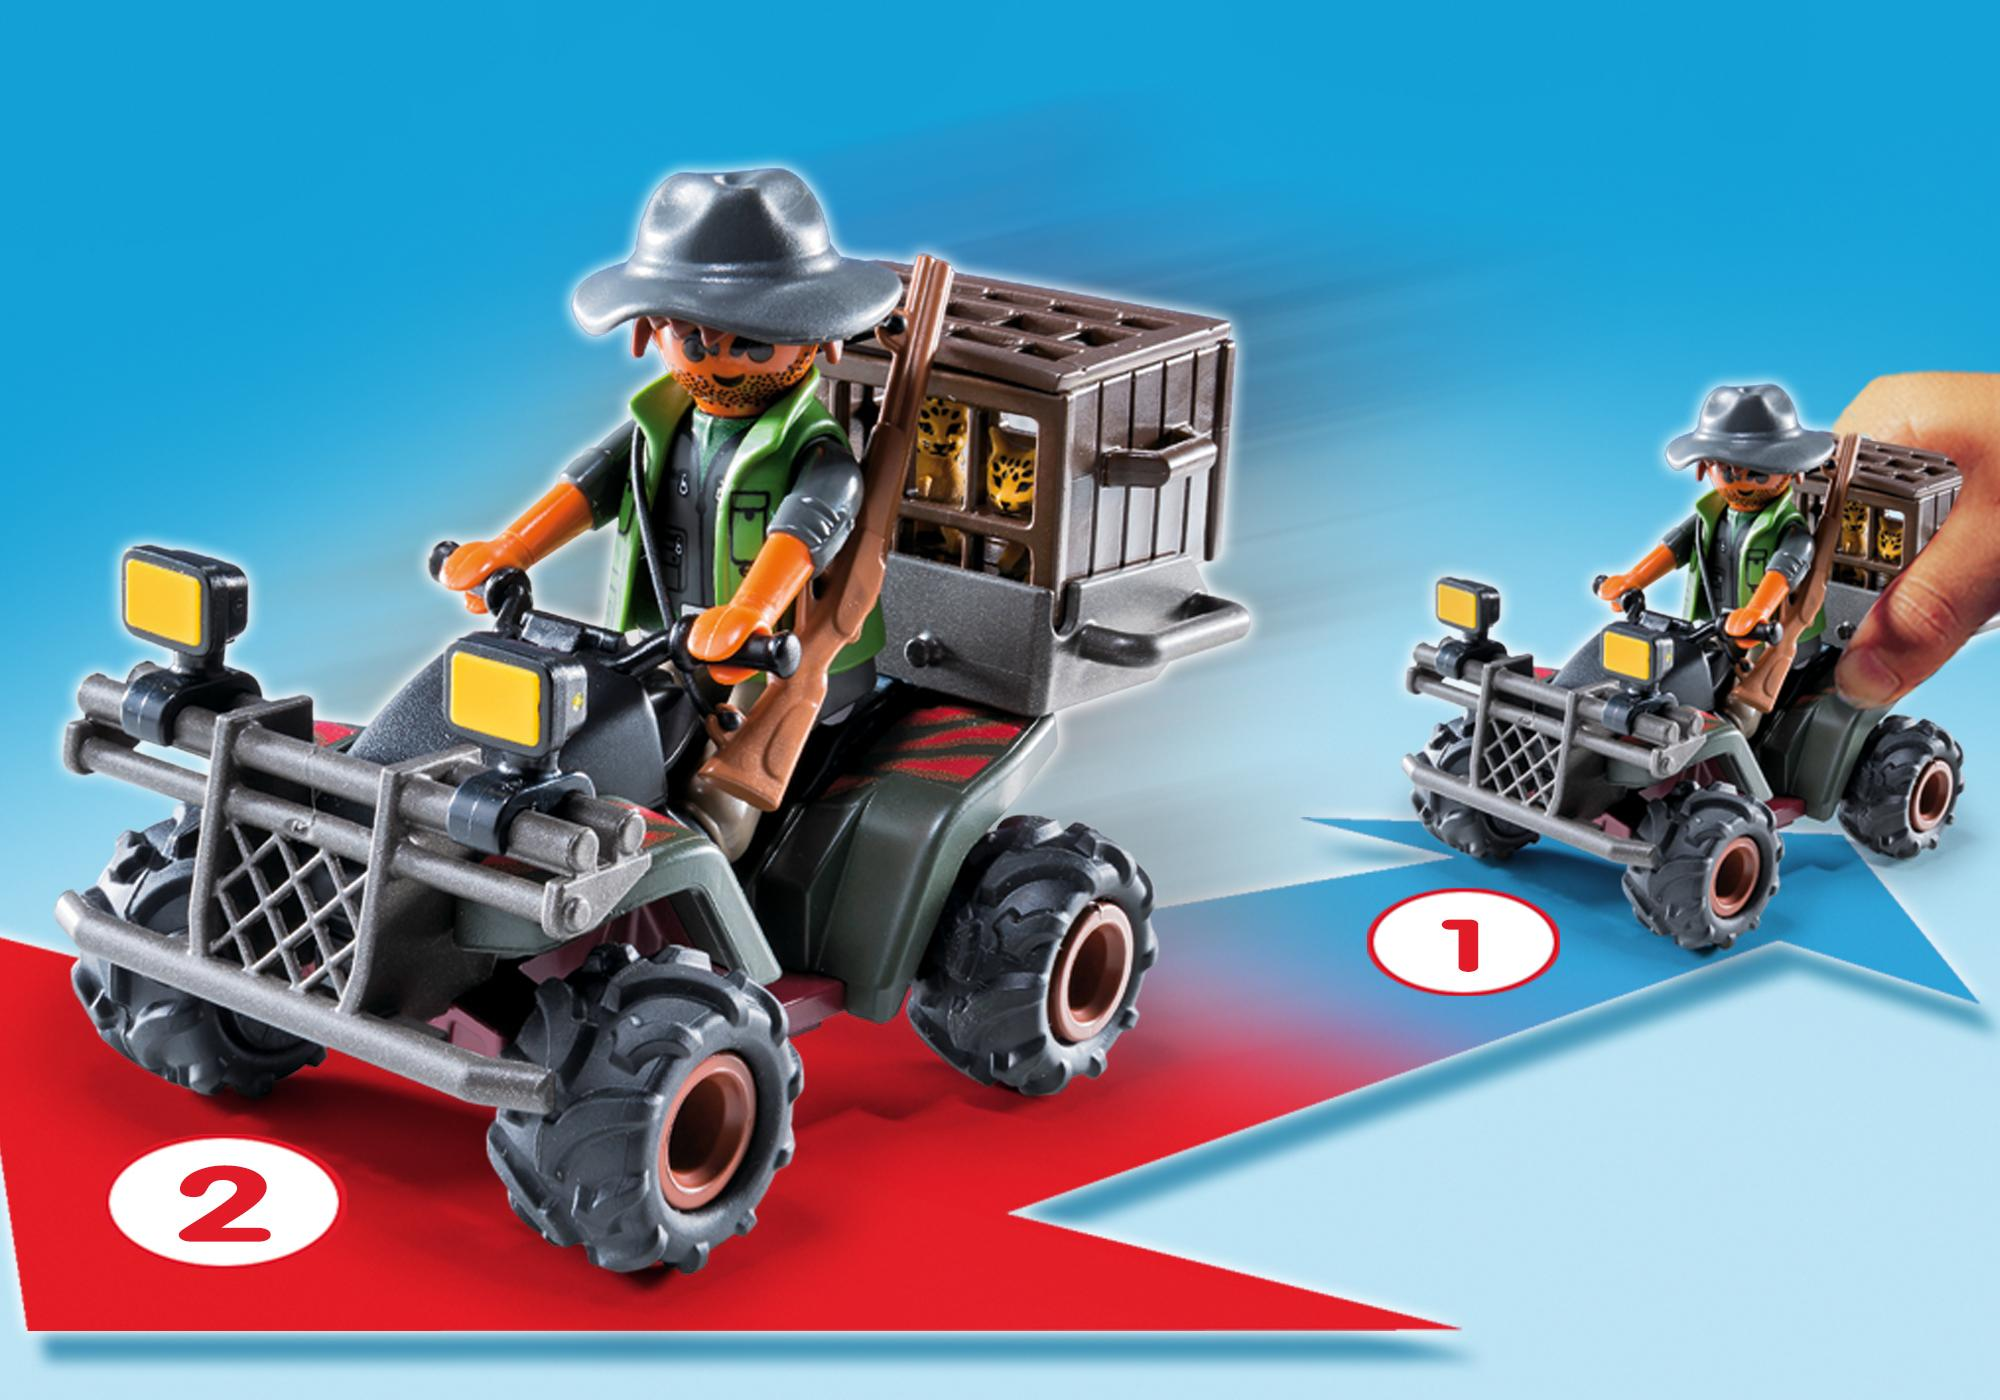 http://media.playmobil.com/i/playmobil/6939_product_extra1